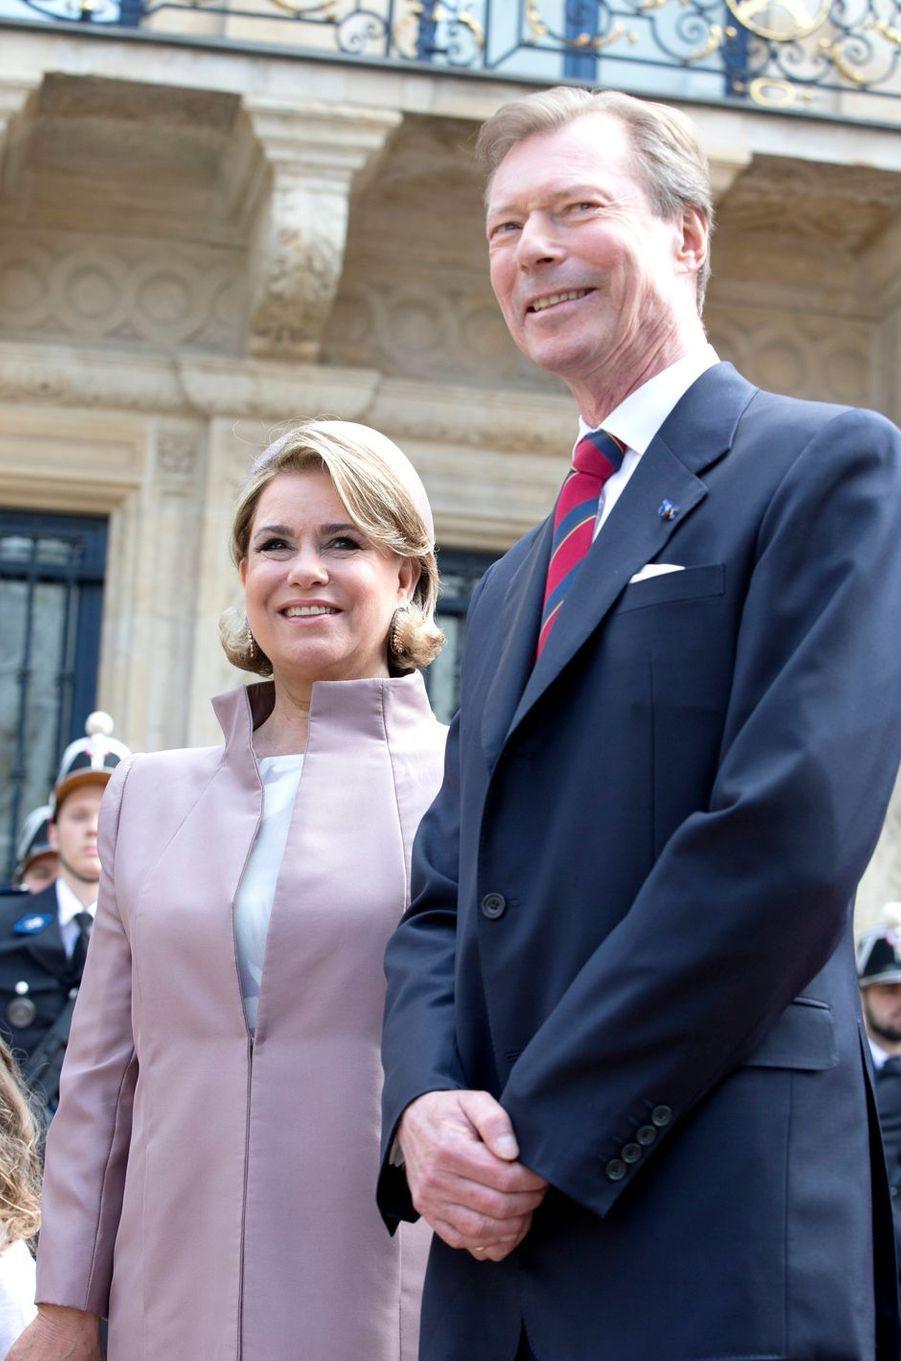 La grande-duchesse Maria Teresa et le grand-duc Henri de Luxembourg à Luxembourg, le 23 mai 2018